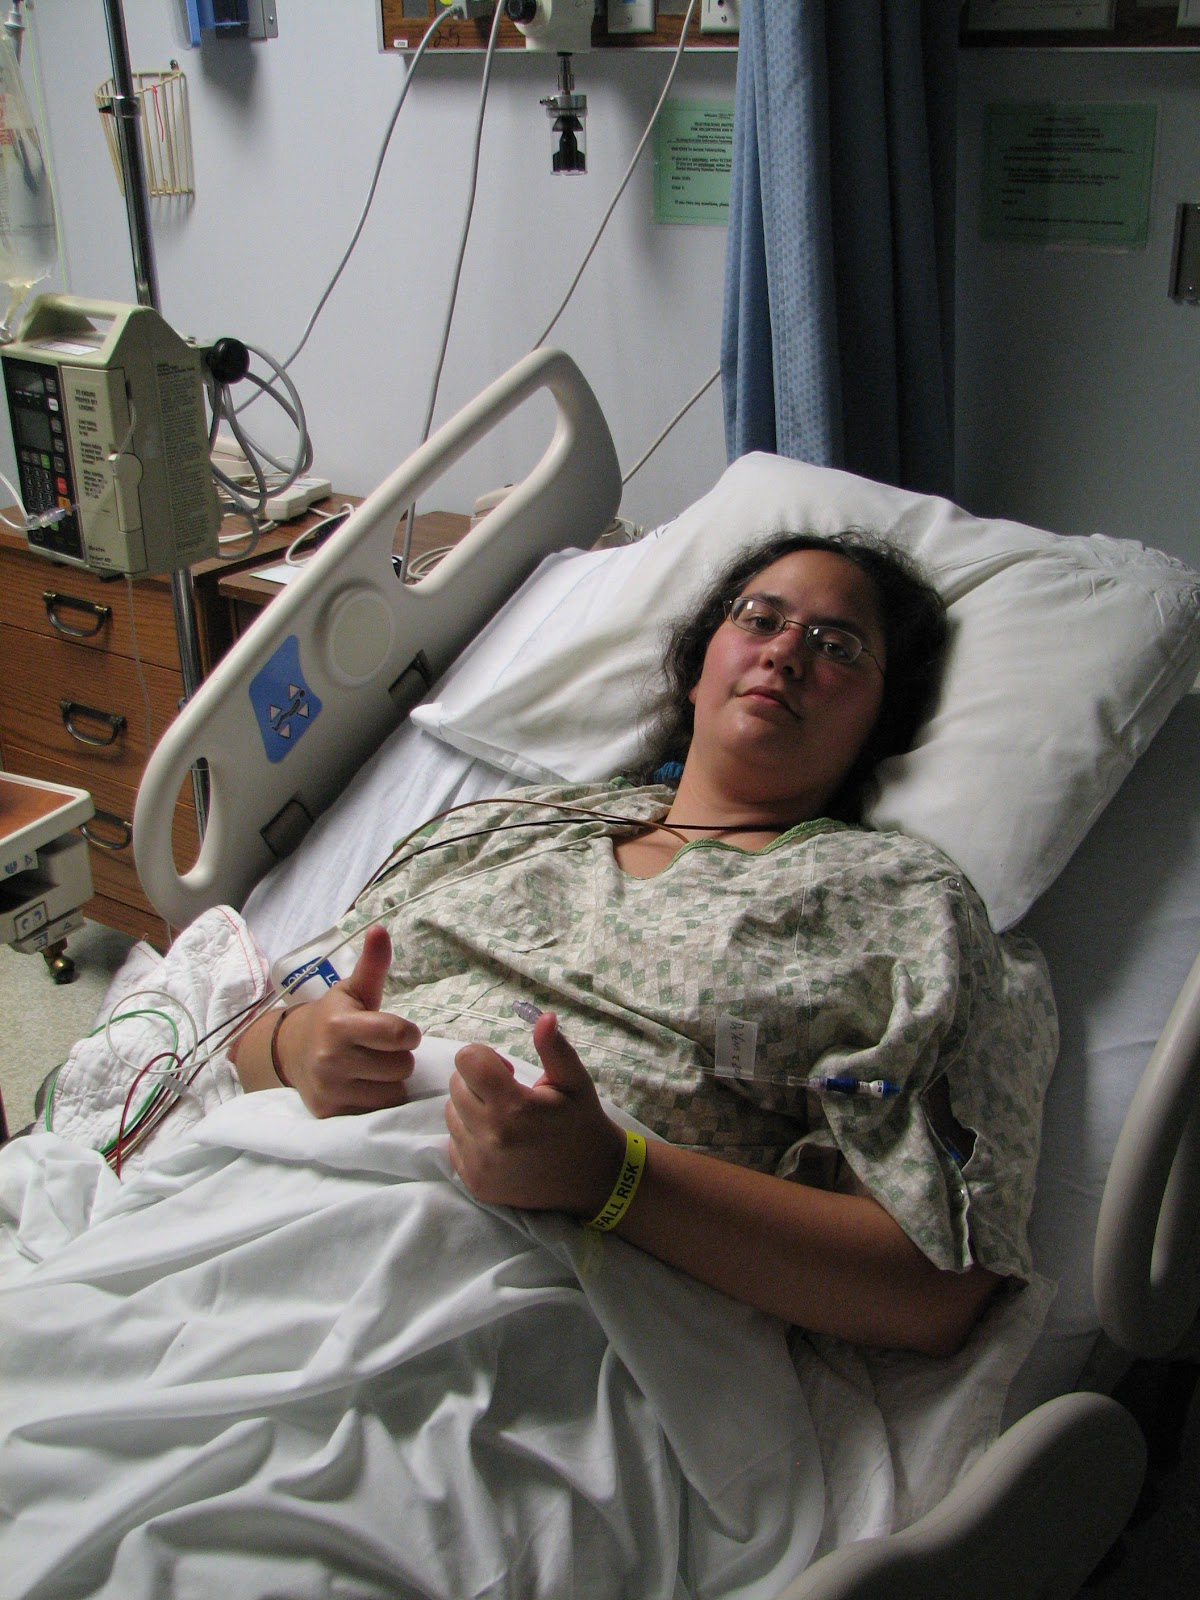 Colonoscopy Room: Turner's Tokens: My GBS Experience: Hospital To Half